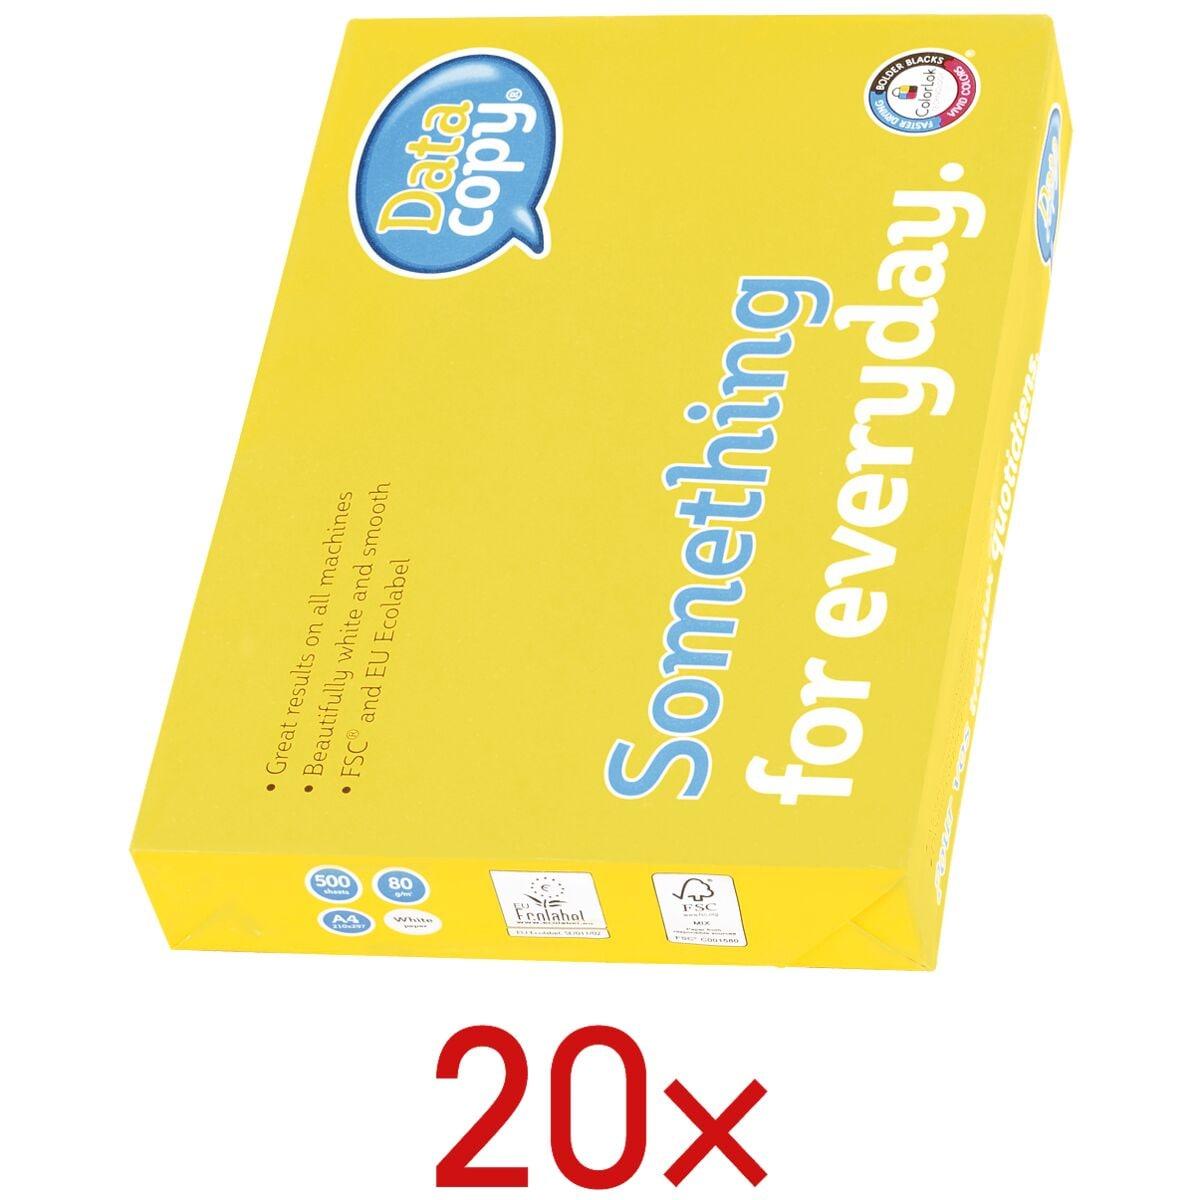 20x Multifunctioneel printpapier A4 Data-Copy Everyday Printing - 10000 bladen (totaal), 80 g/m²